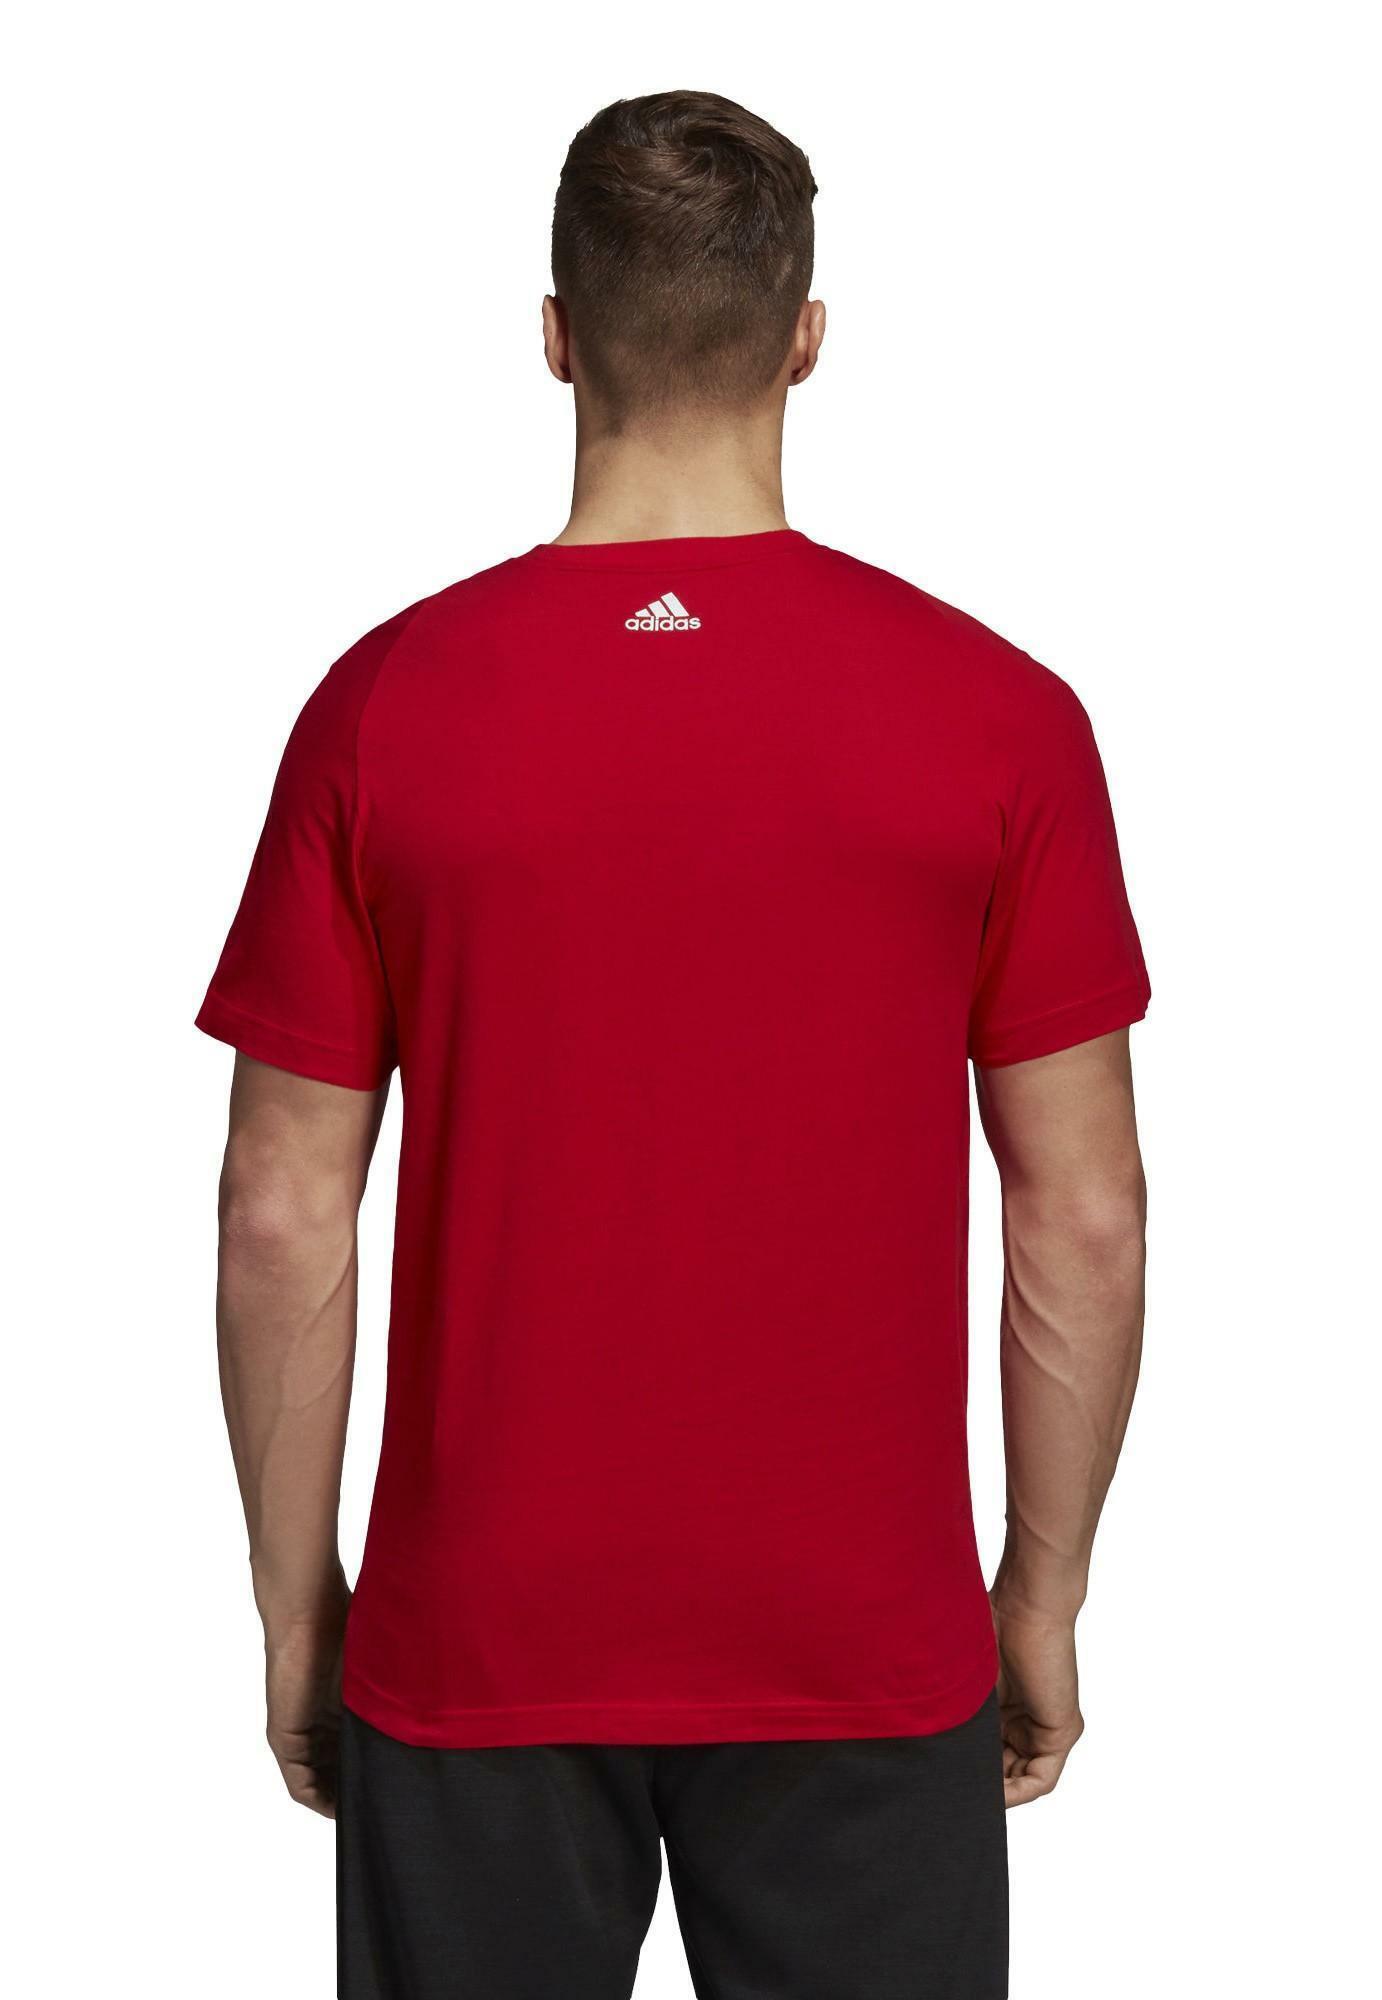 adidas adidas linear tee t-shirt uomo rossa cz7509